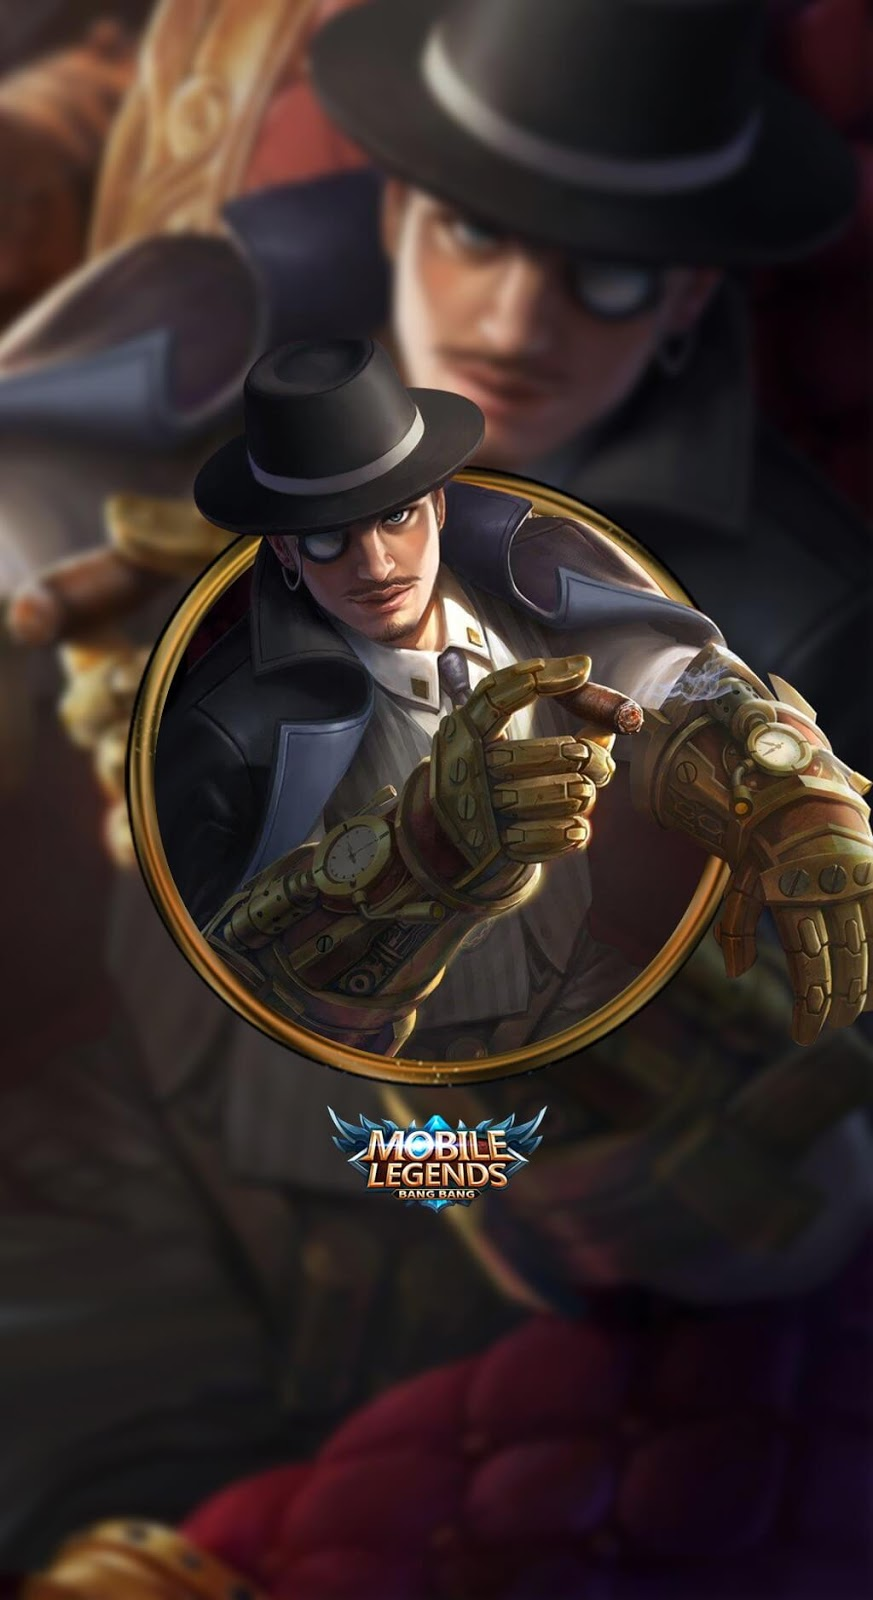 Wallpaper Roger Dark Gent Skin Mobile Legends HD for Mobile